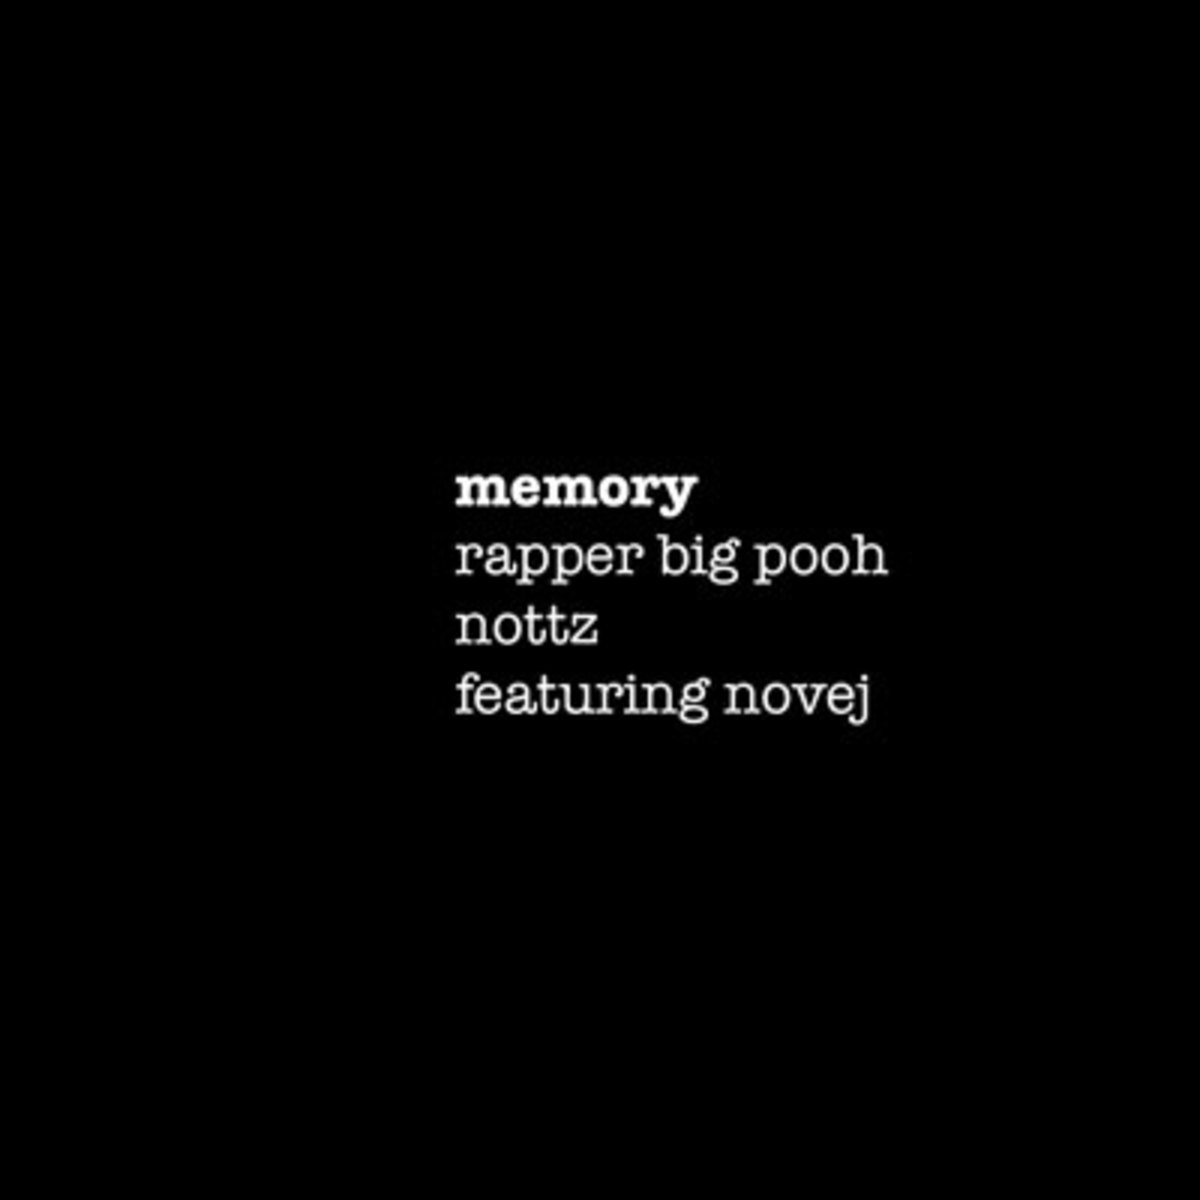 rapper-big-pooh-memory.jpg